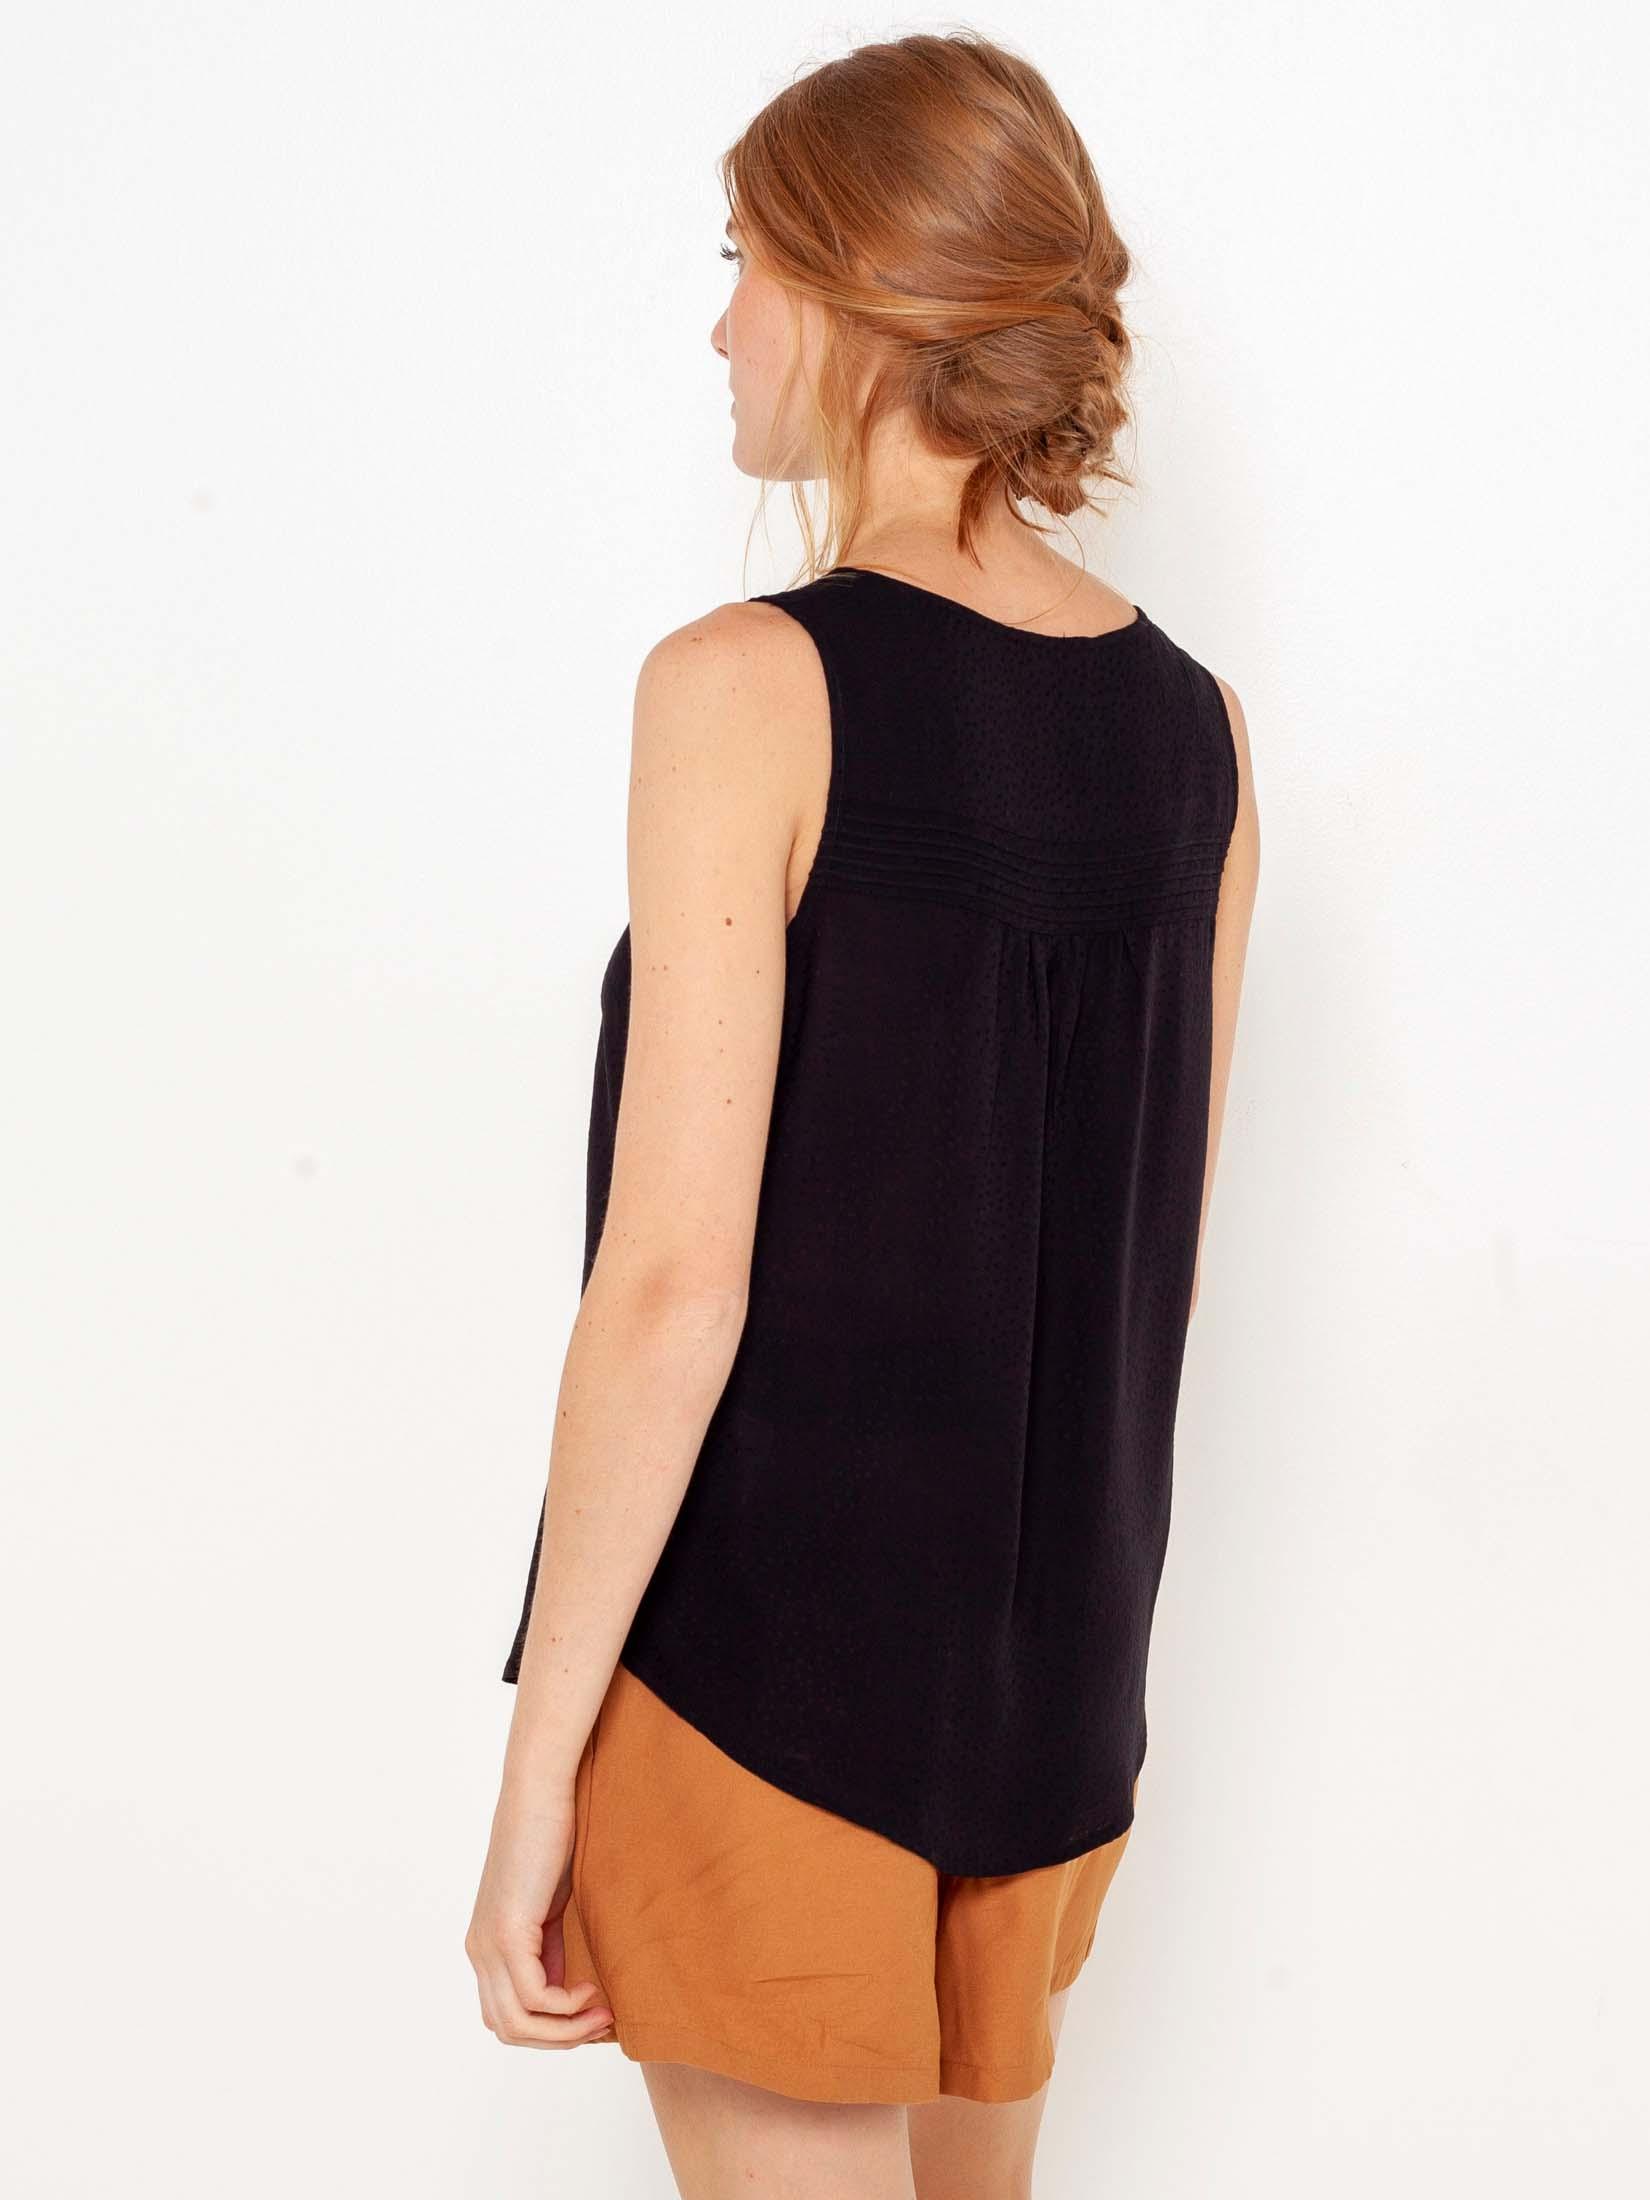 CAMAIEU Women's blouse black